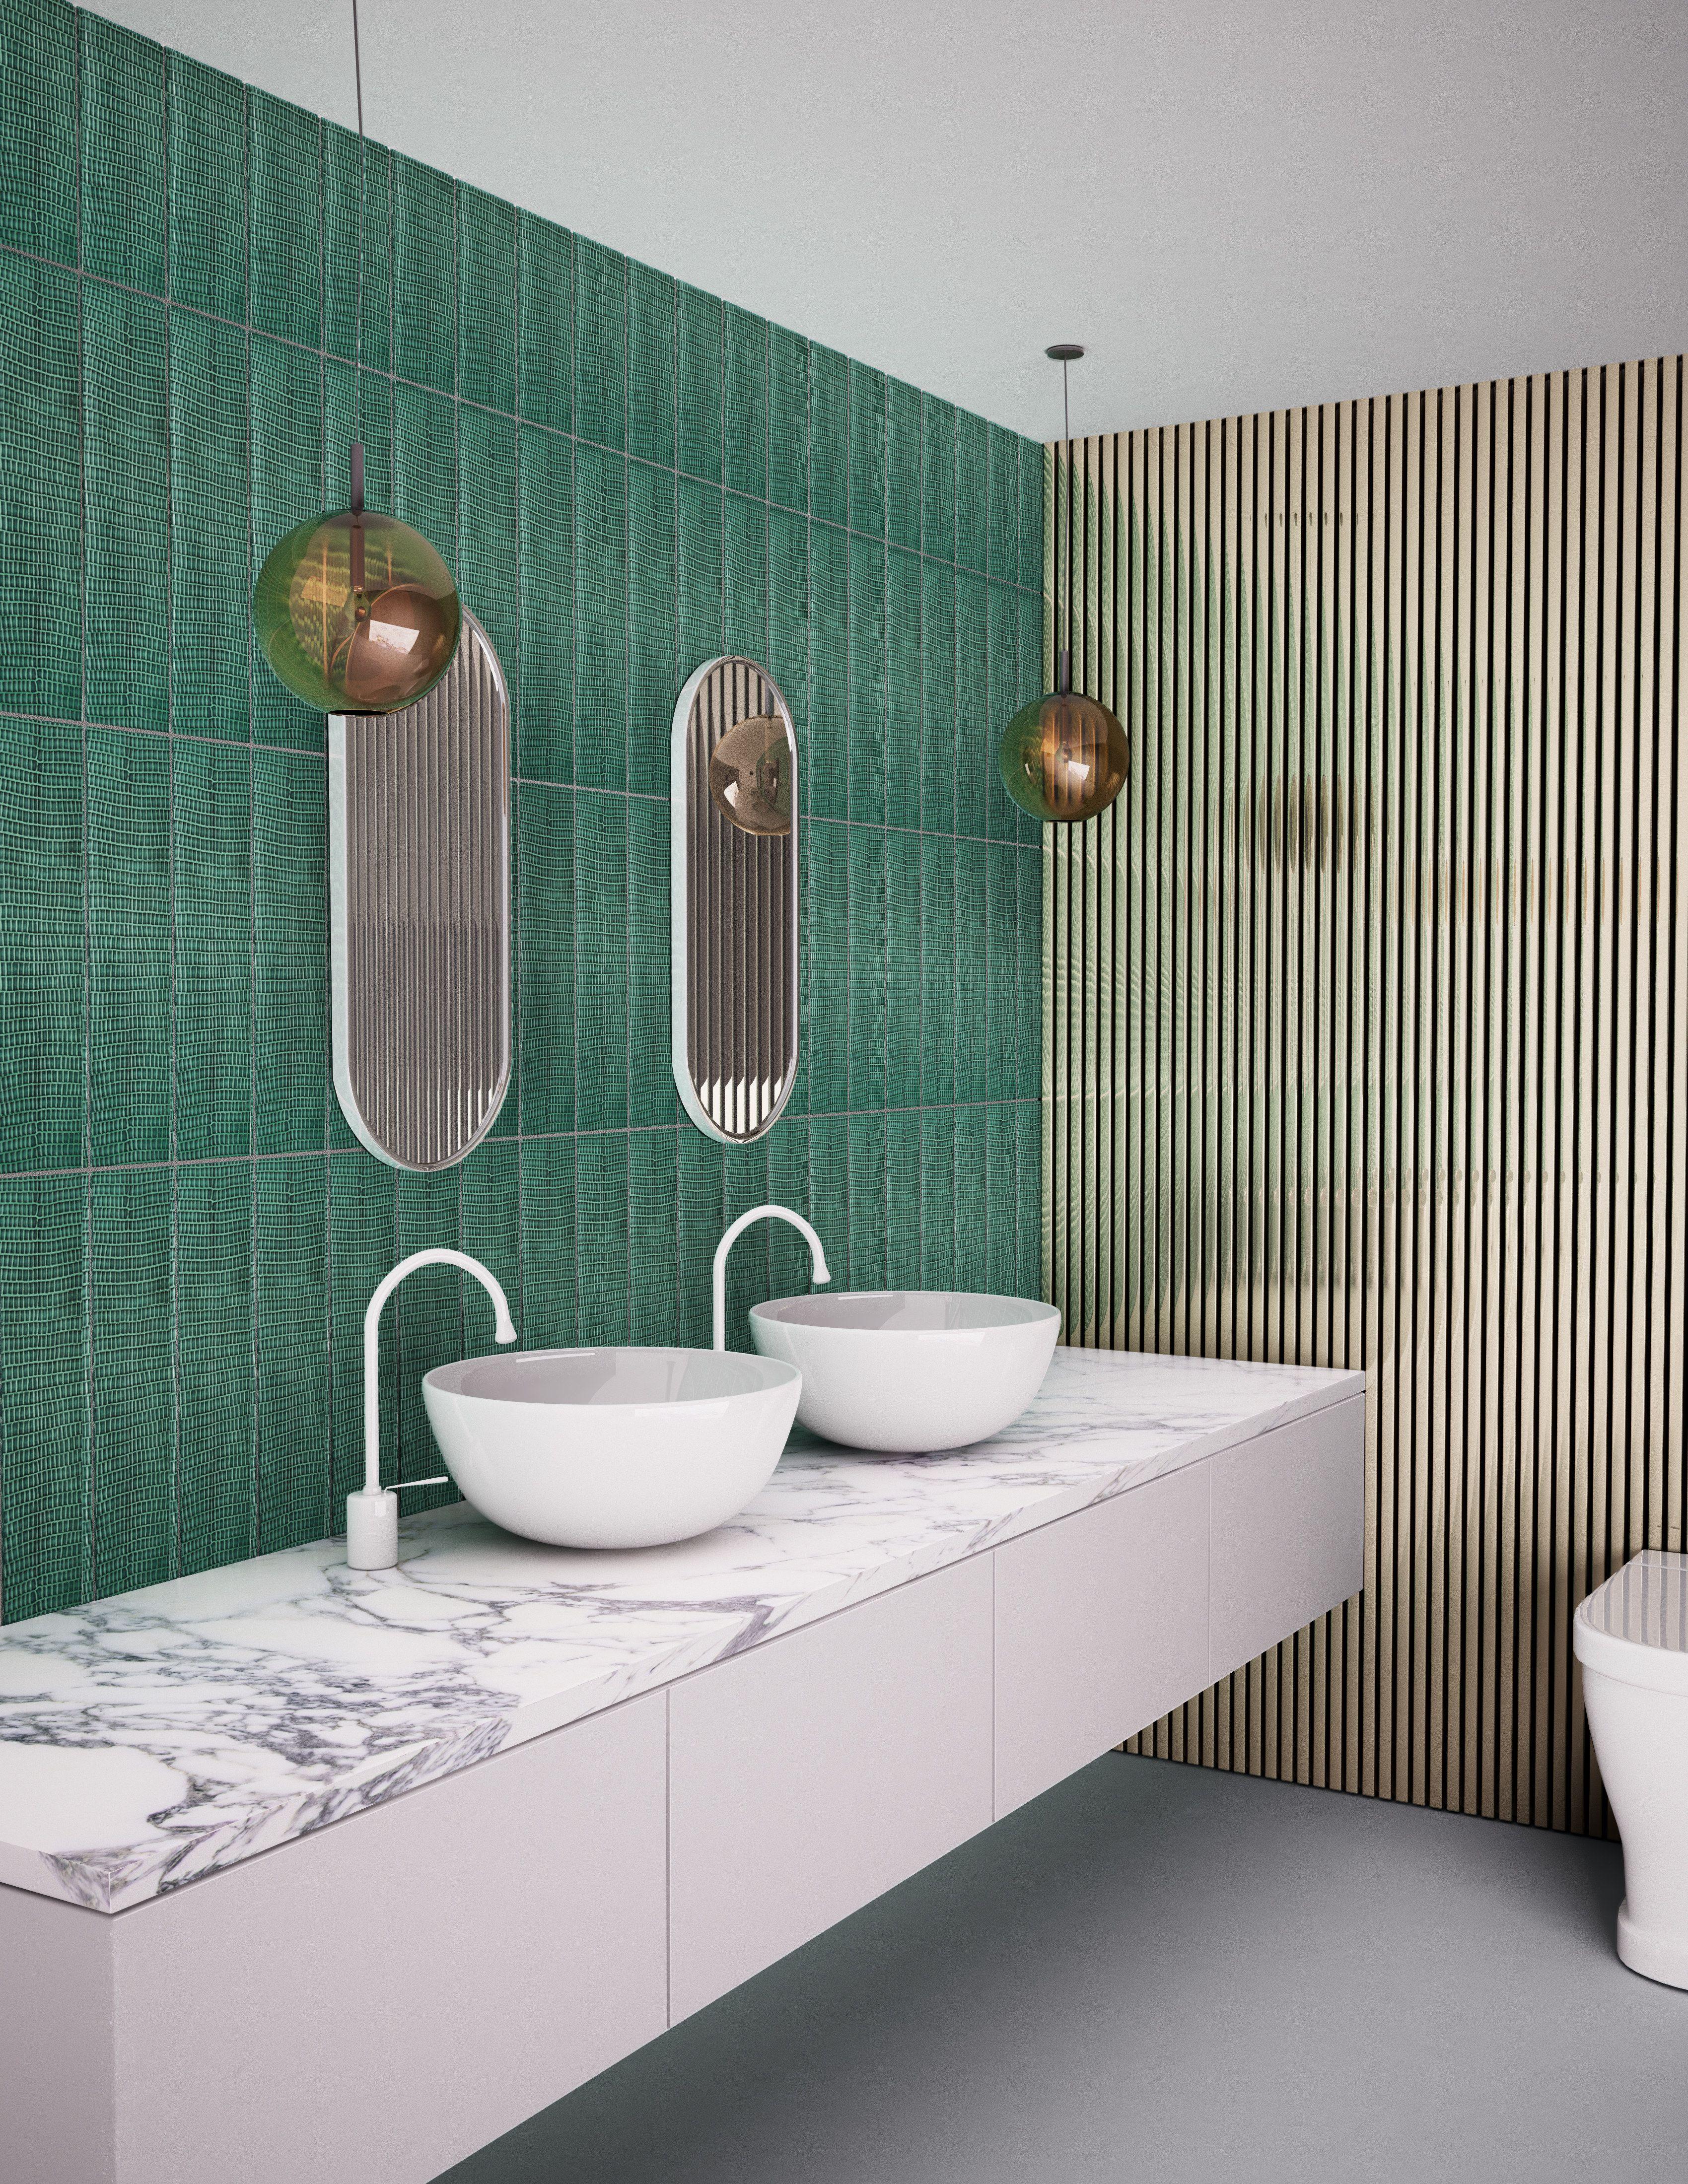 The Best New Tile Trends For 2019 Tile Trends Latest Bathroom Tiles Mosaic Tiles Diy